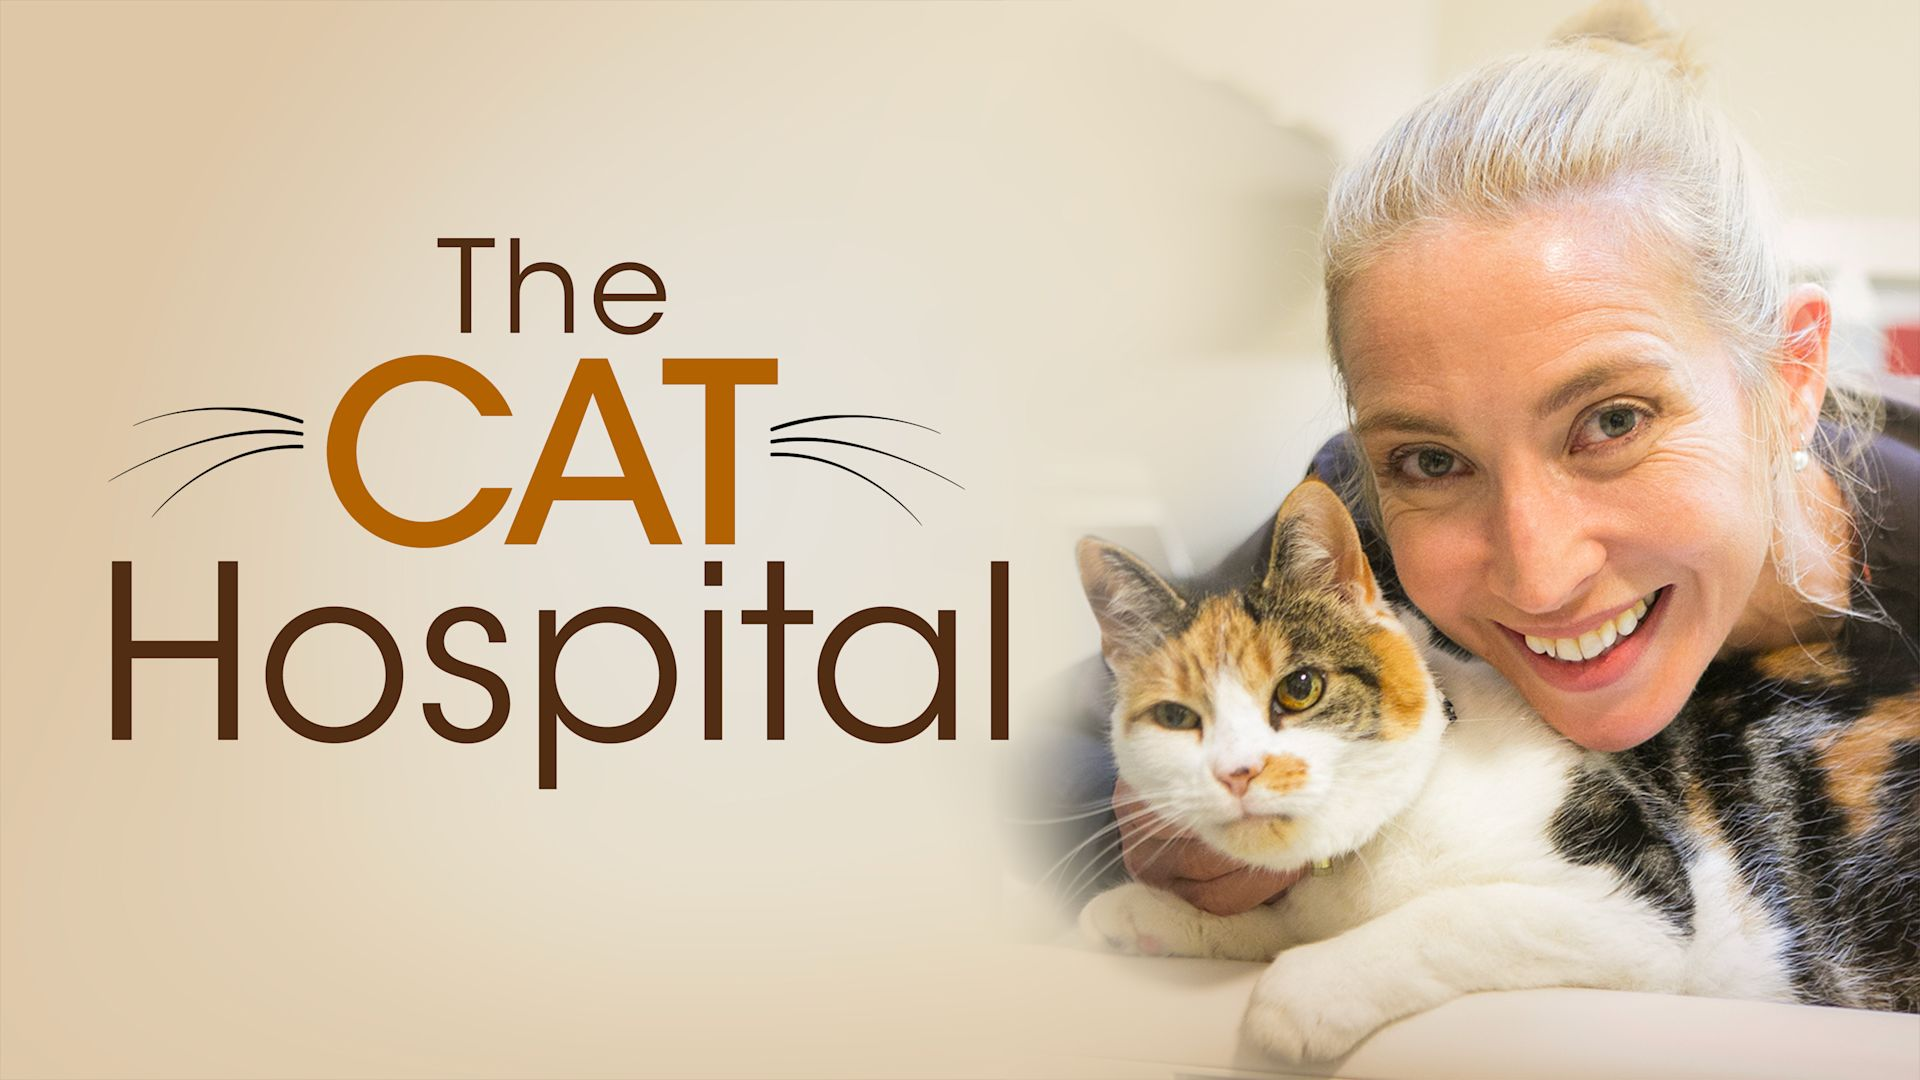 Cat Hospital - Series 1